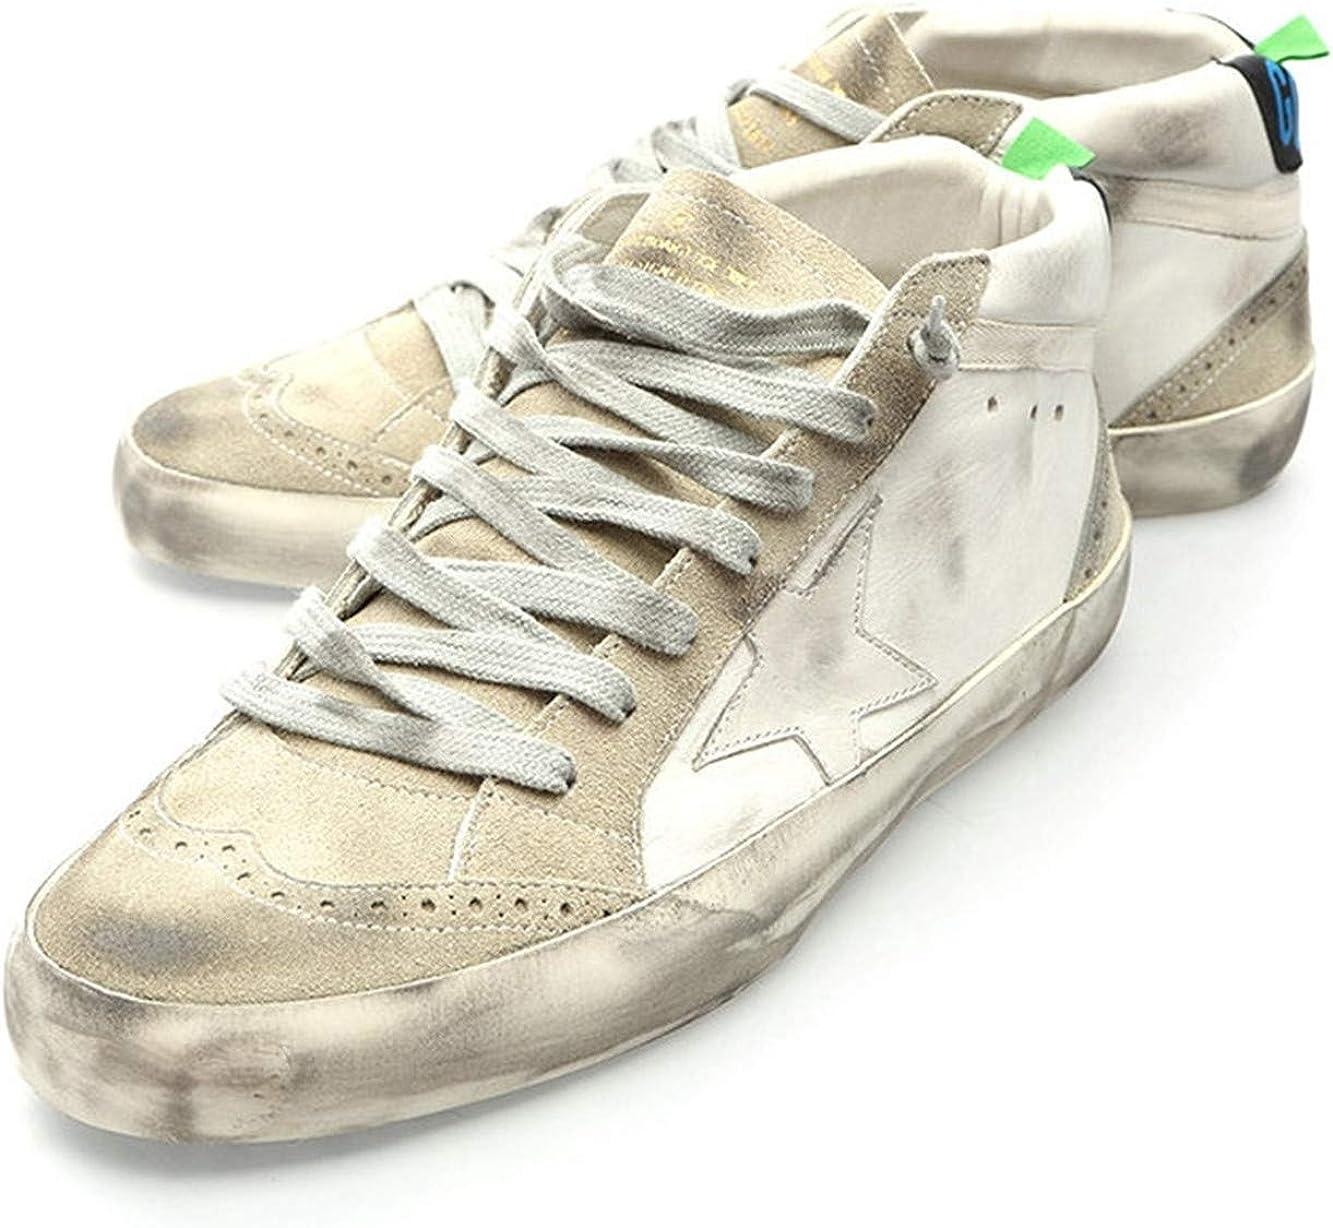 Golden Gooses Sneakers Luxury Fashion